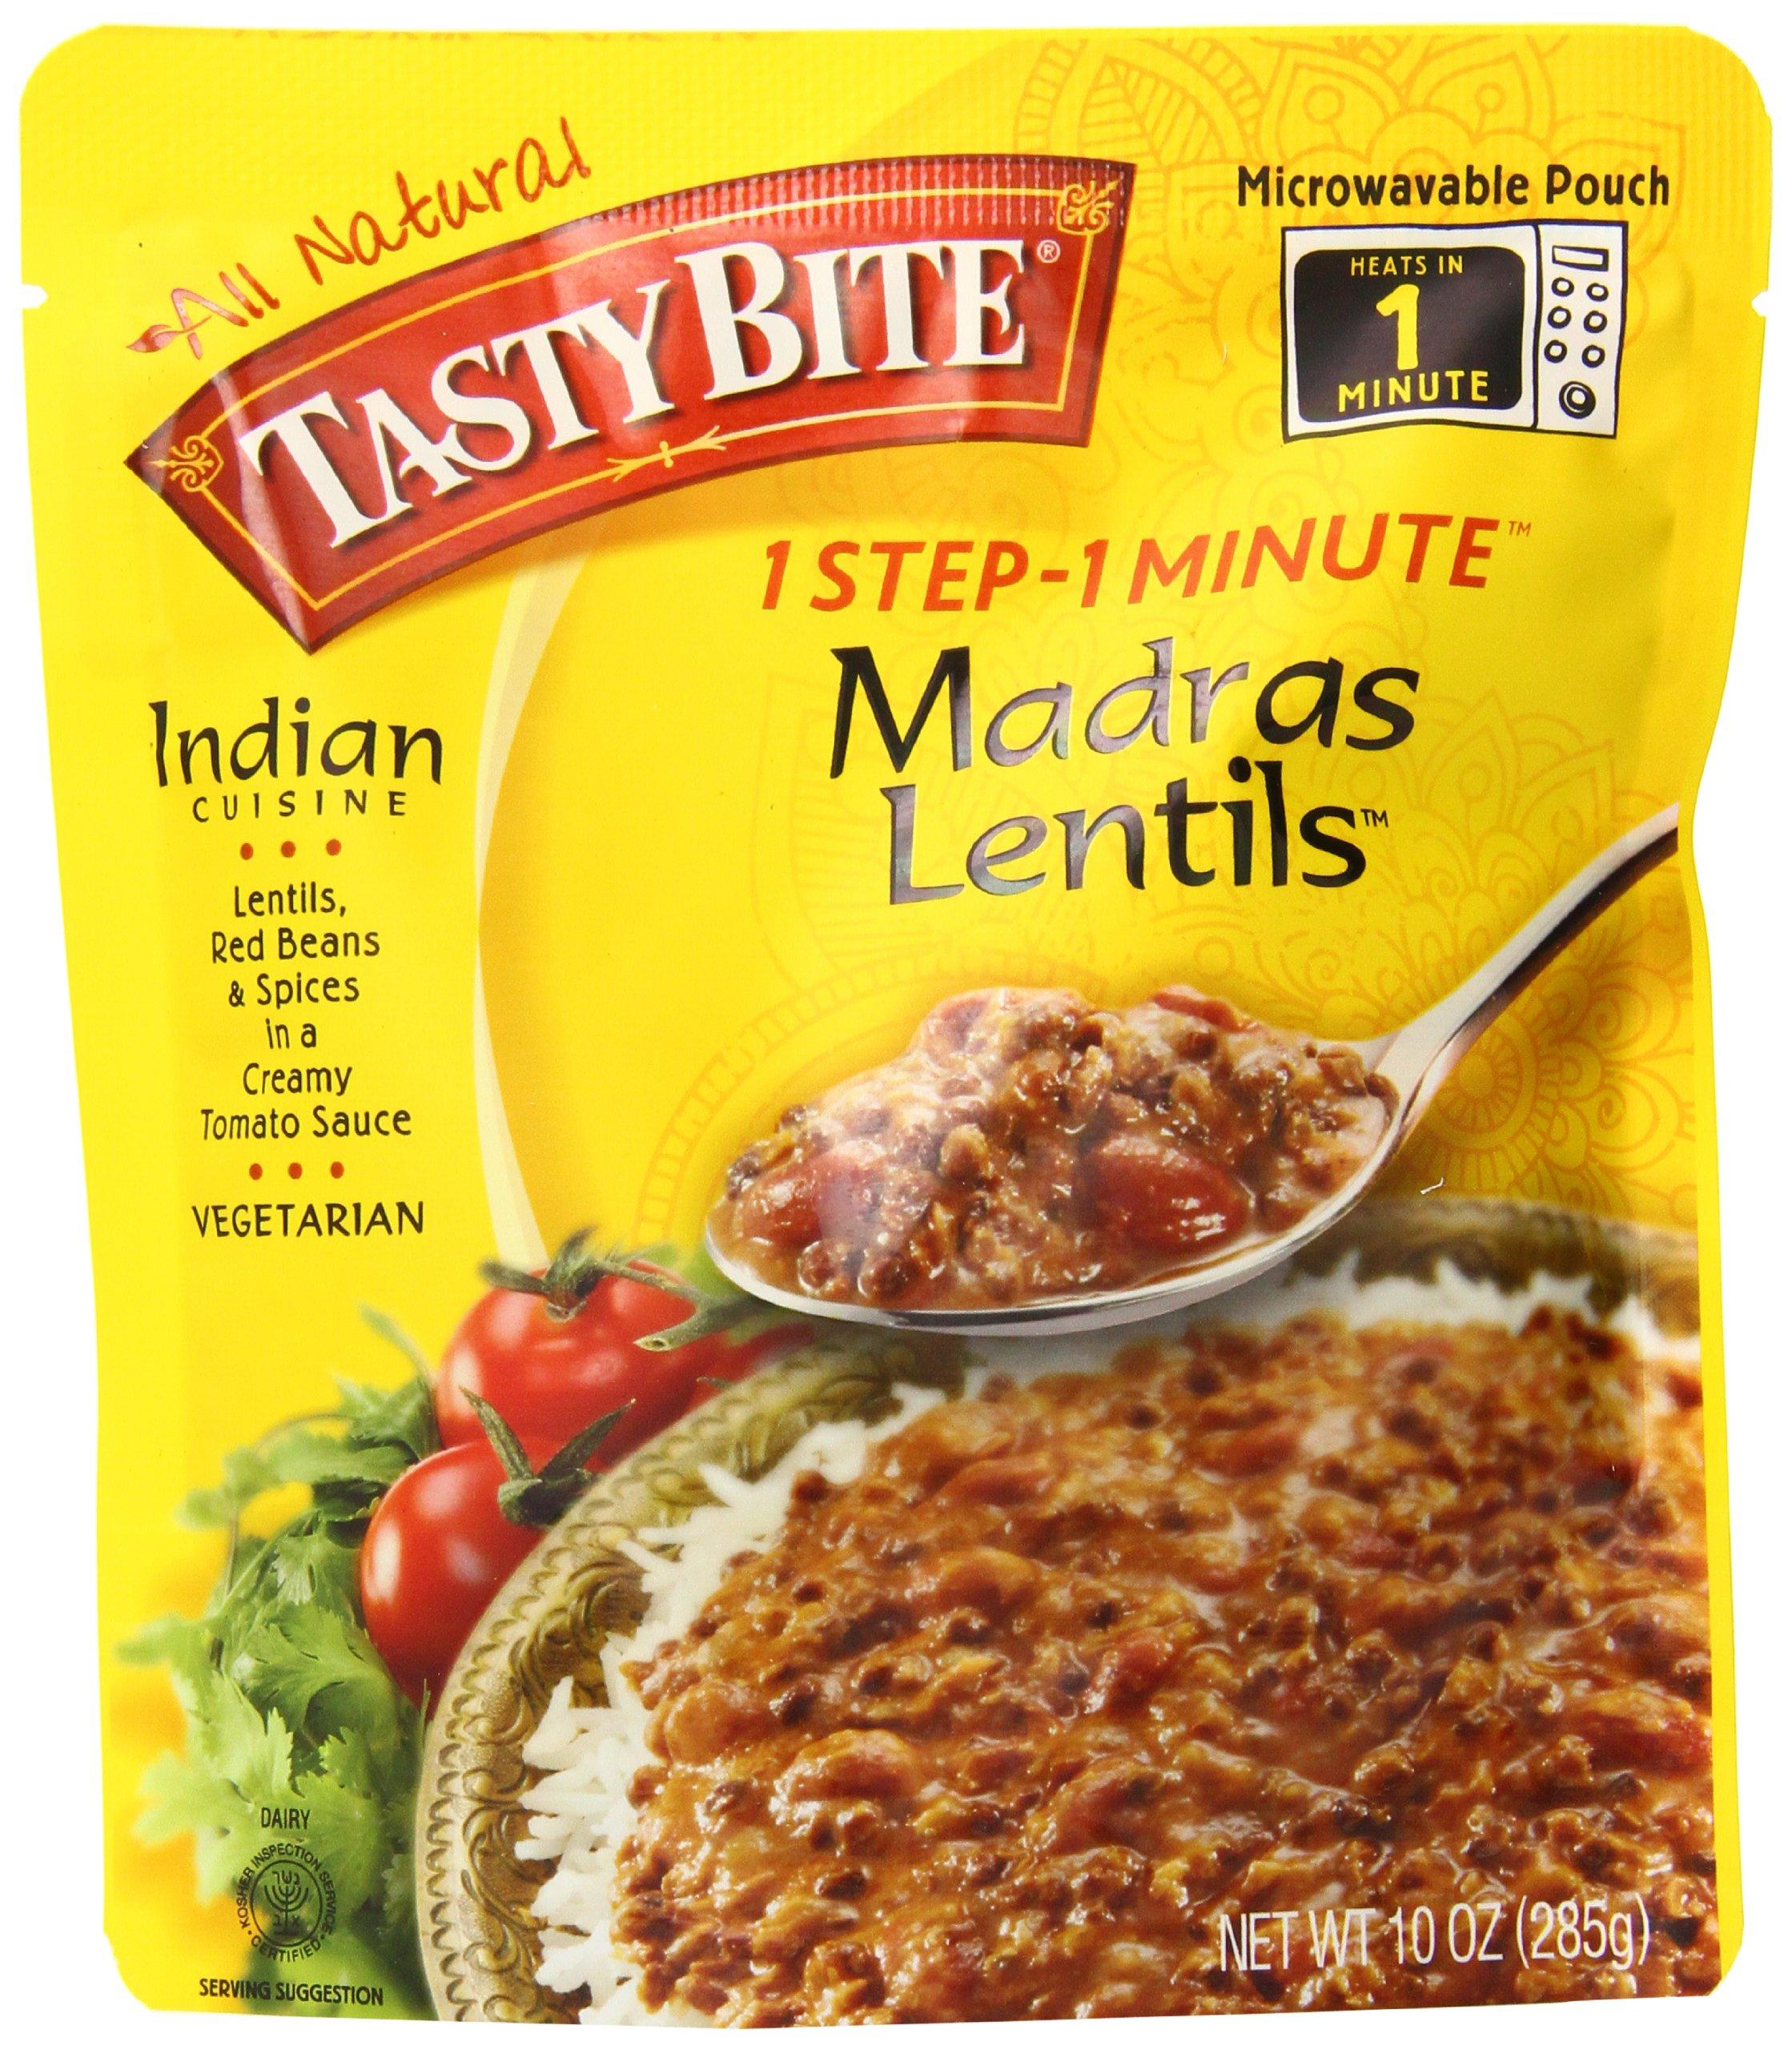 Tasty Bite Madras Lentils 6x 285g Pouches Buy Online In Bulgaria At Bulgaria Desertcart Com Productid 61708375